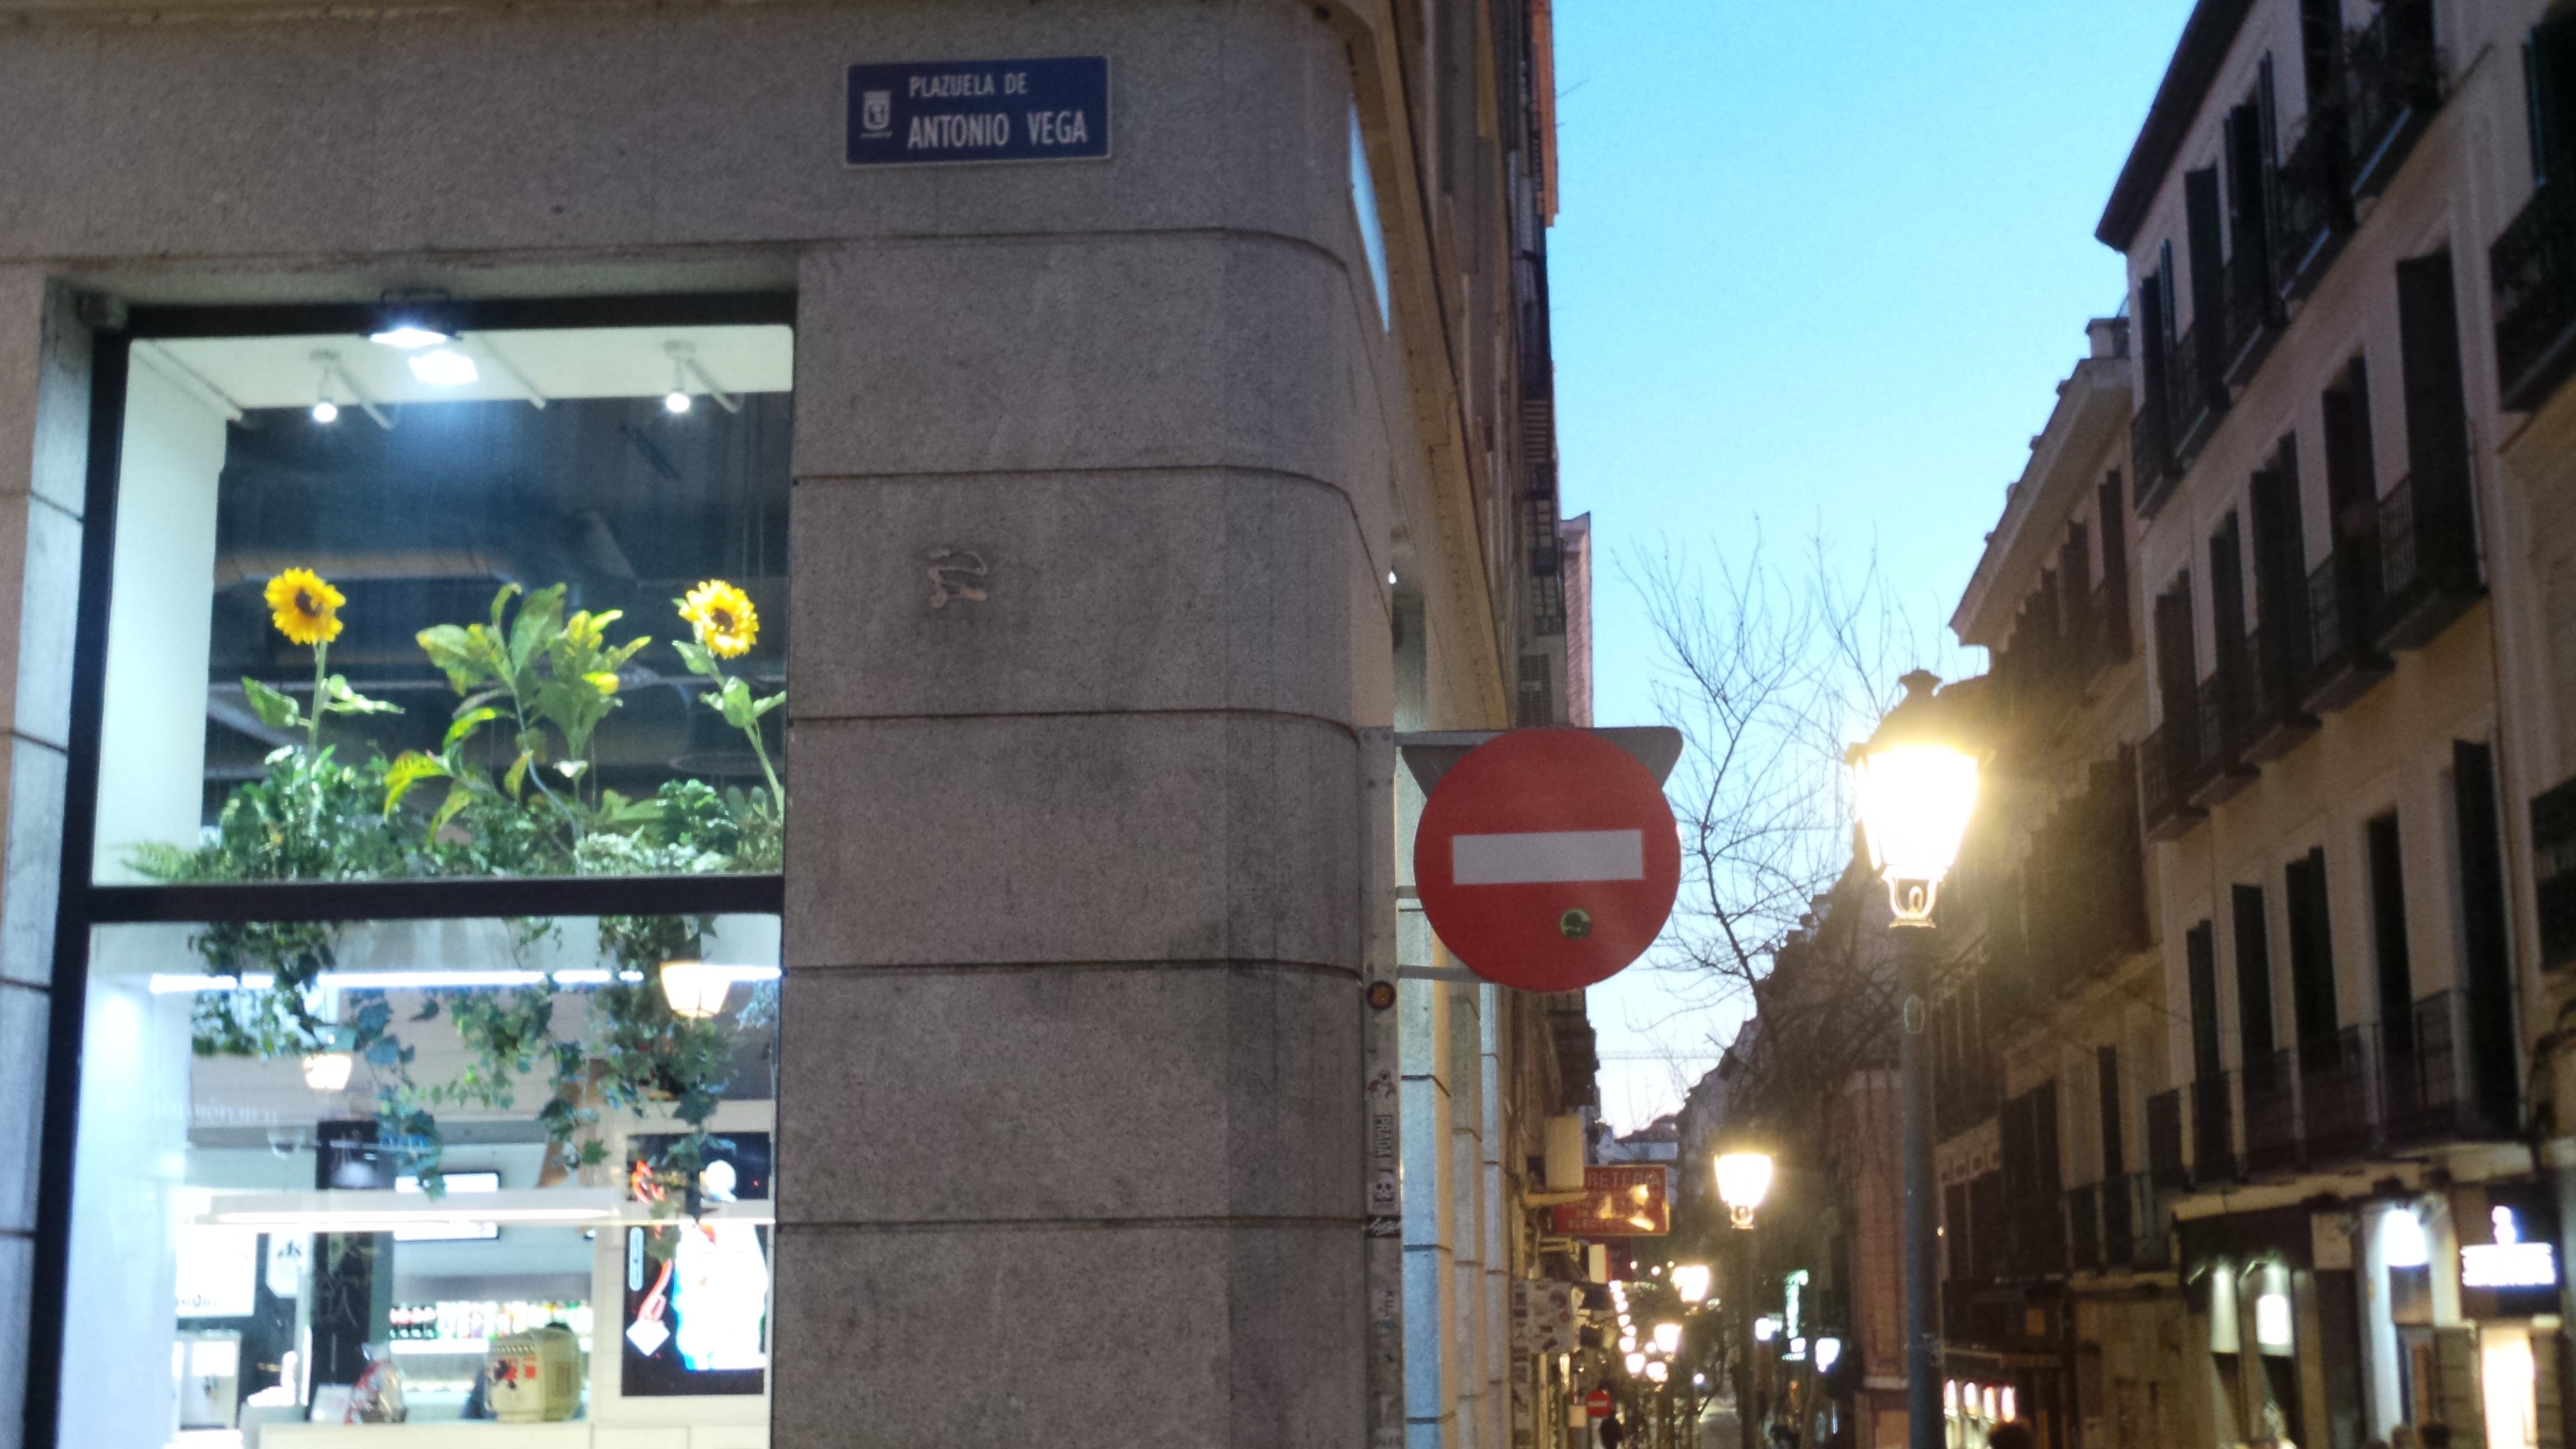 Plazuela de Antonio Vega junto a la Corredera Alta de San Pablo de Madrid